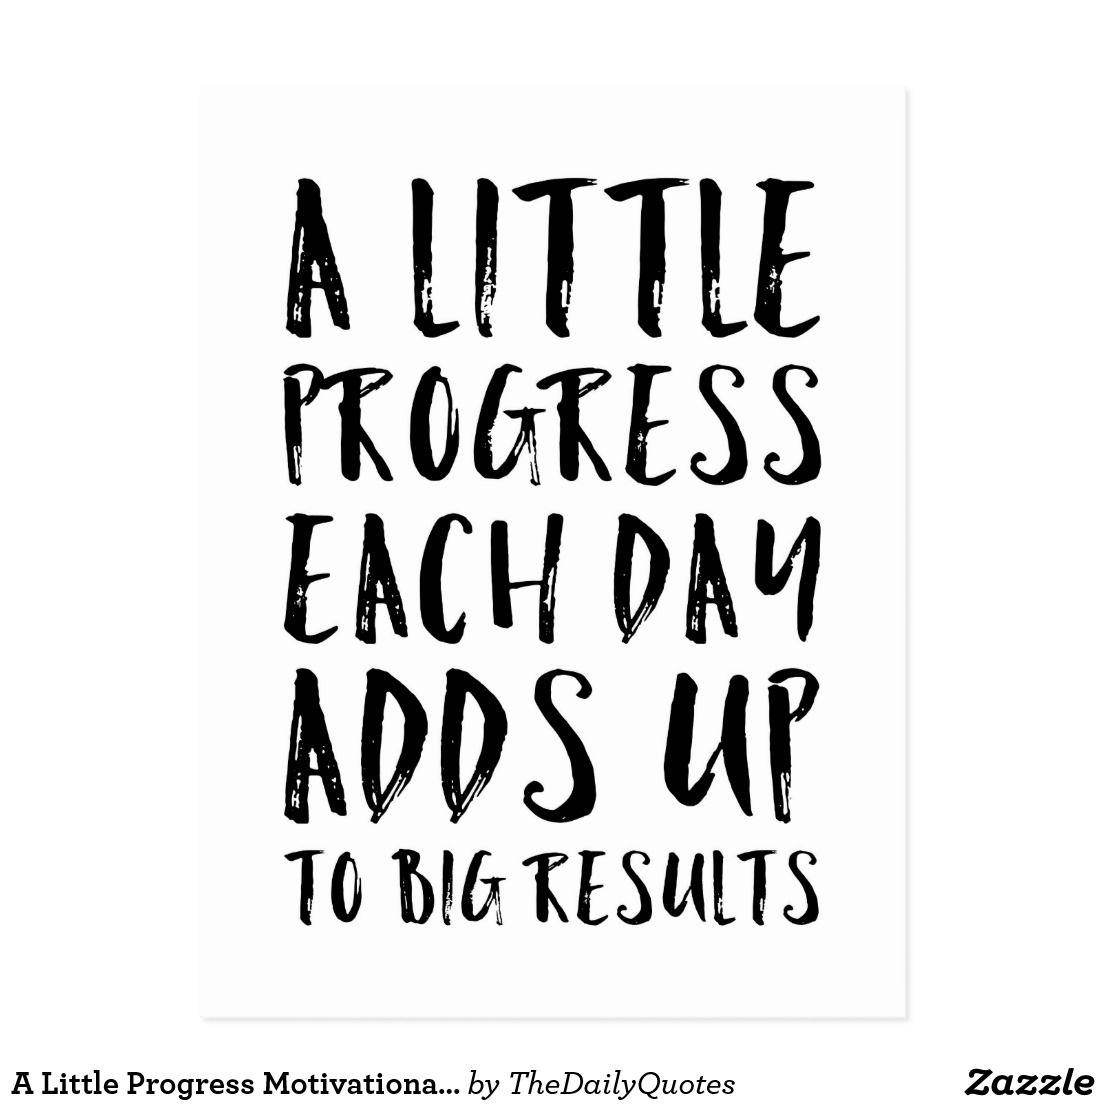 A Little Progress Motivational Quote Postcard